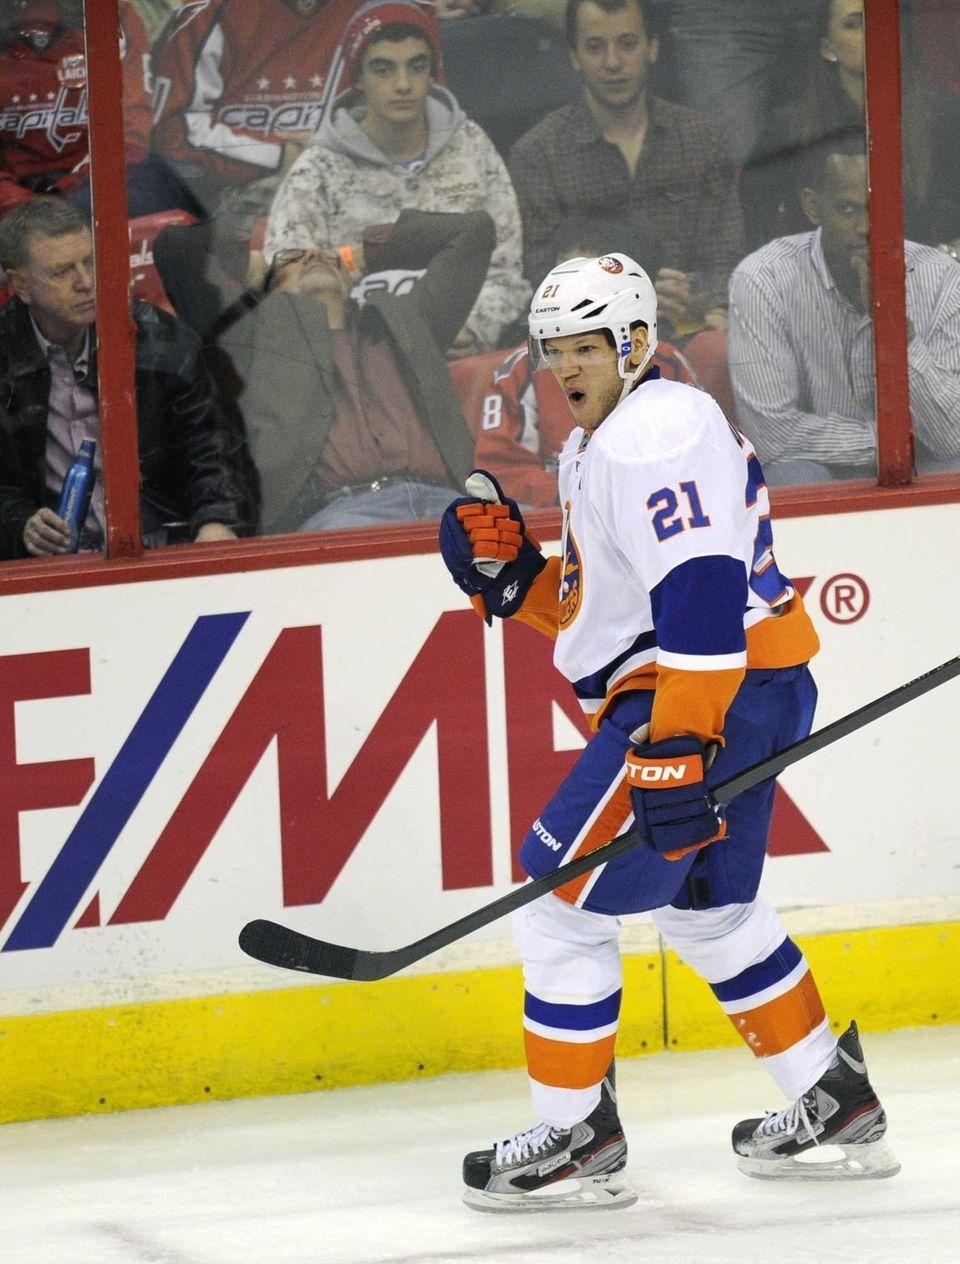 Islanders right wing Kyle Okposo celebrates his goal